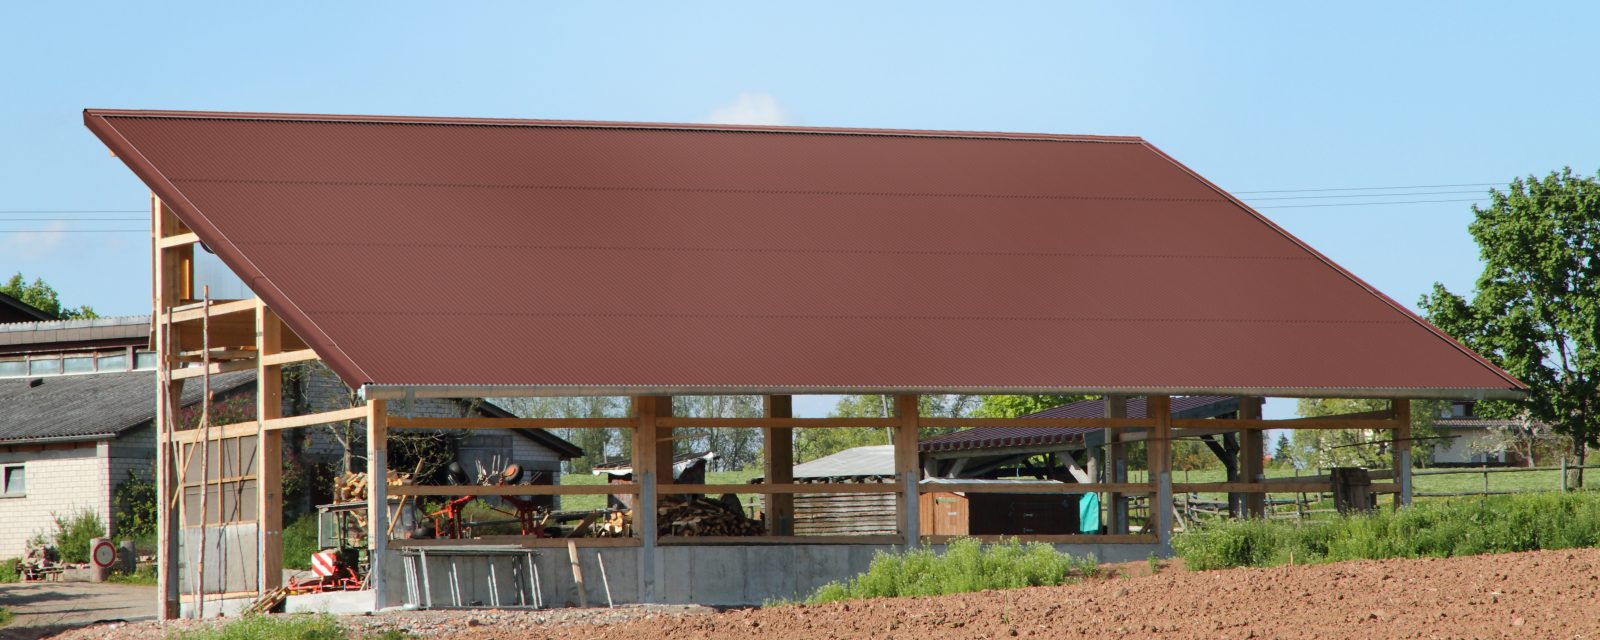 gutta corrugated bitumen sheets brown